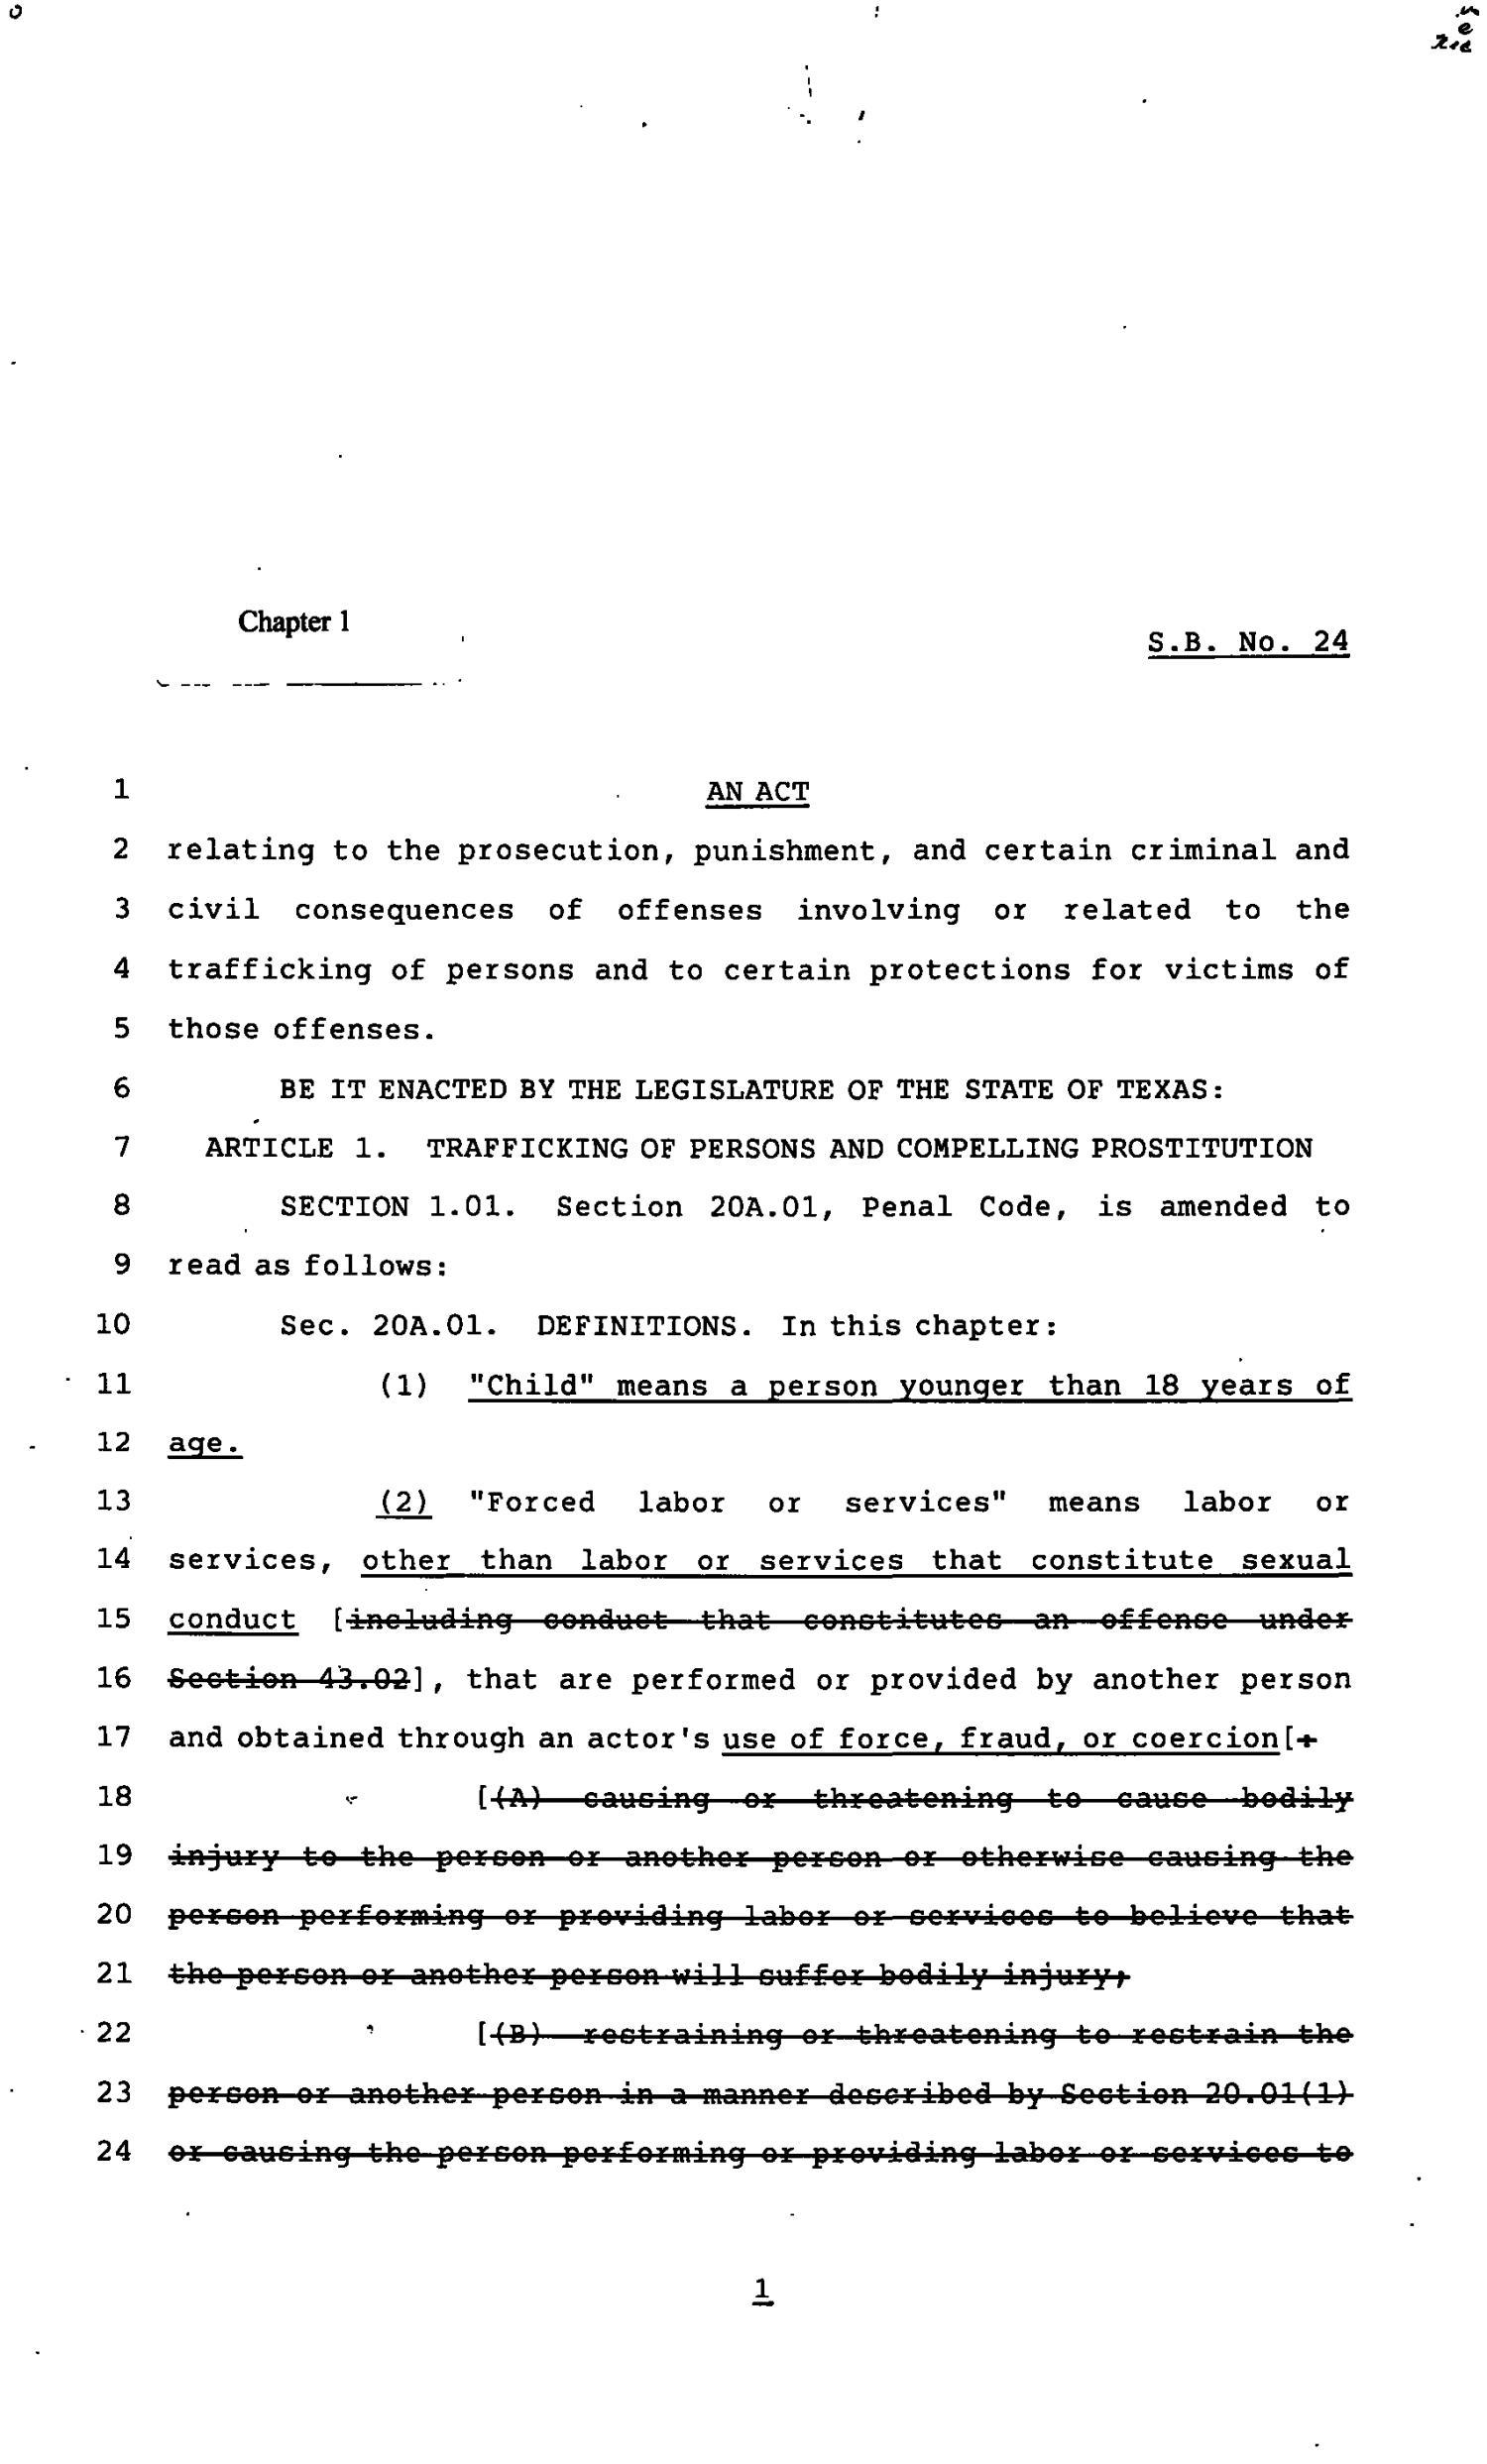 82nd Texas Legislature, Regular Session, Senate Bill 24